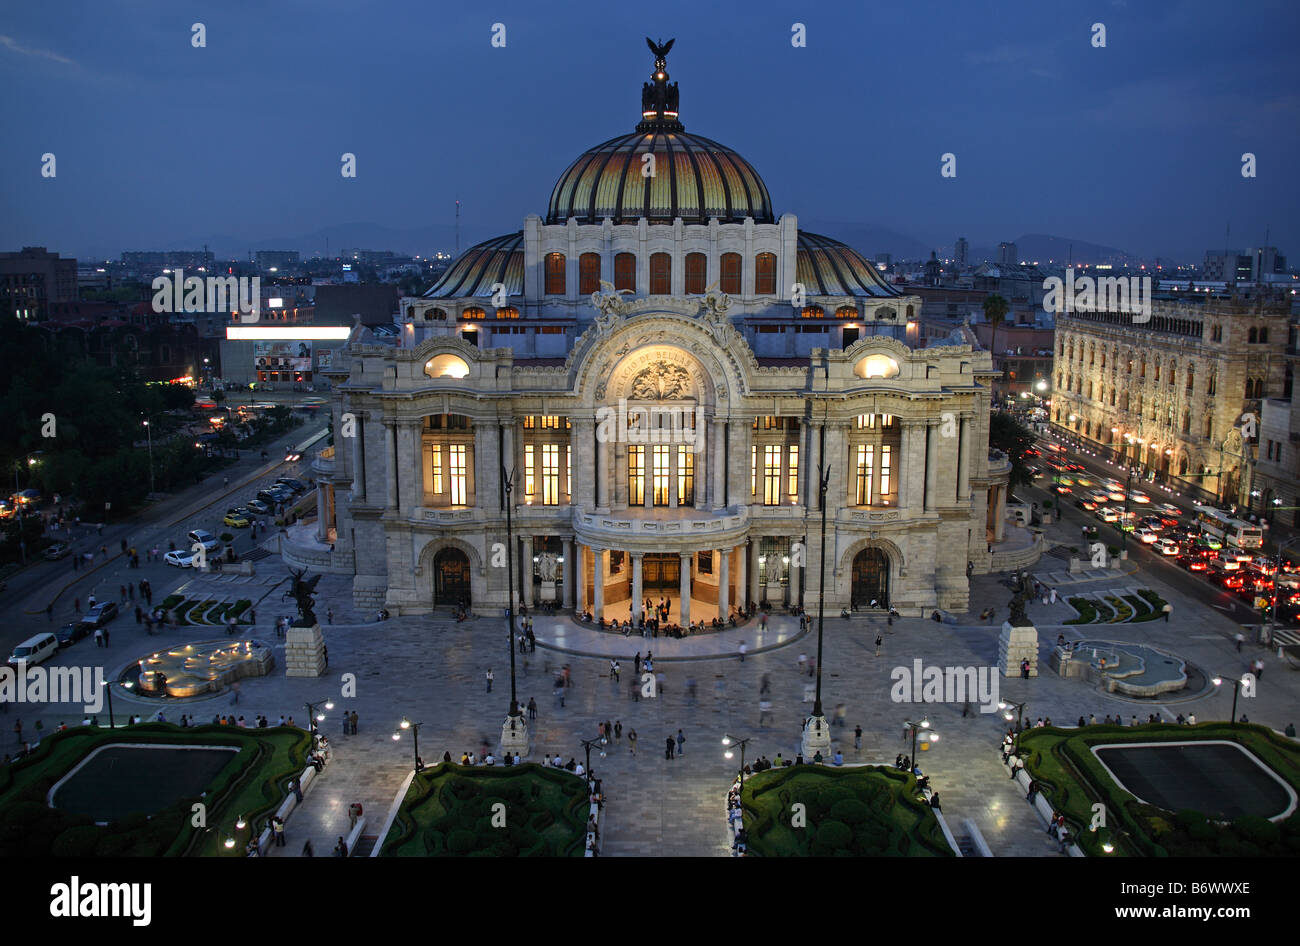 Mexico, Mexico City. Palacio de Bellas Artes ('Palace of Fine Arts') is the premier opera house of Mexico - Stock Image